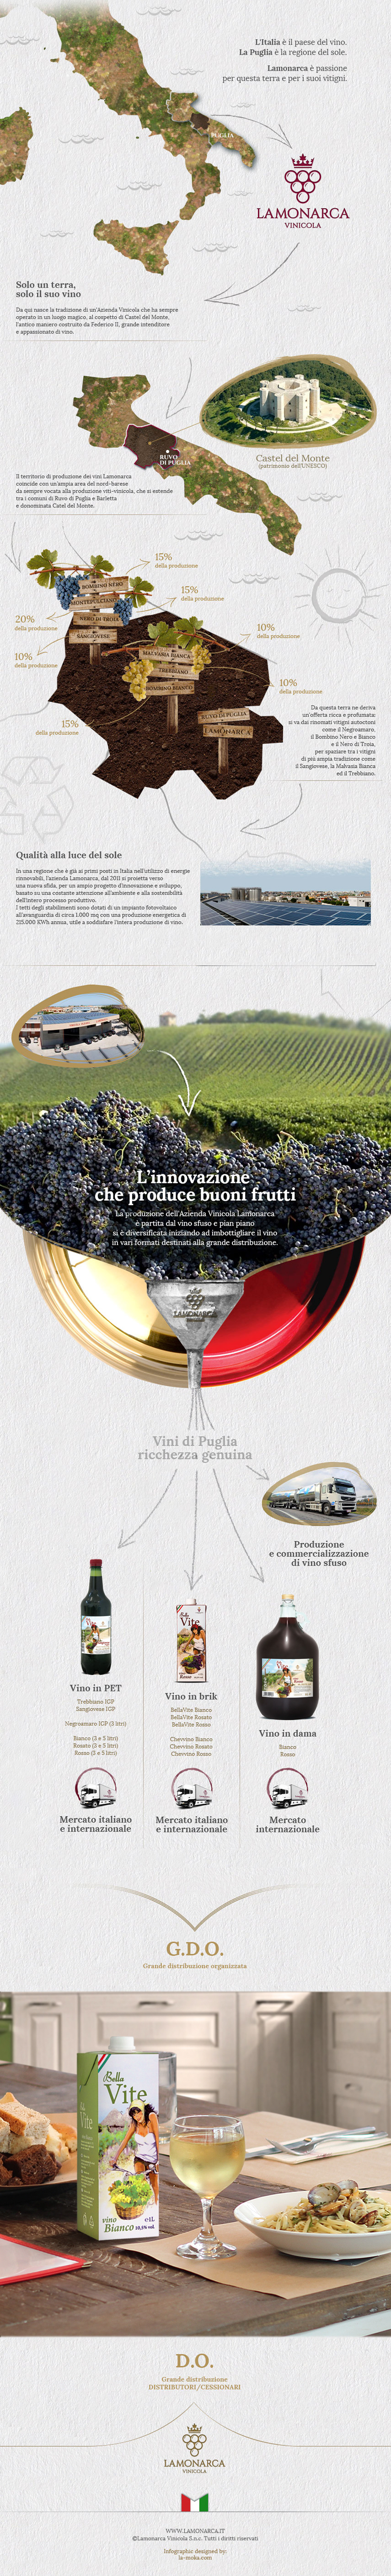 LAMONARCA_website_2015_INFOGRAFICA_azienda_vinicola_italiana